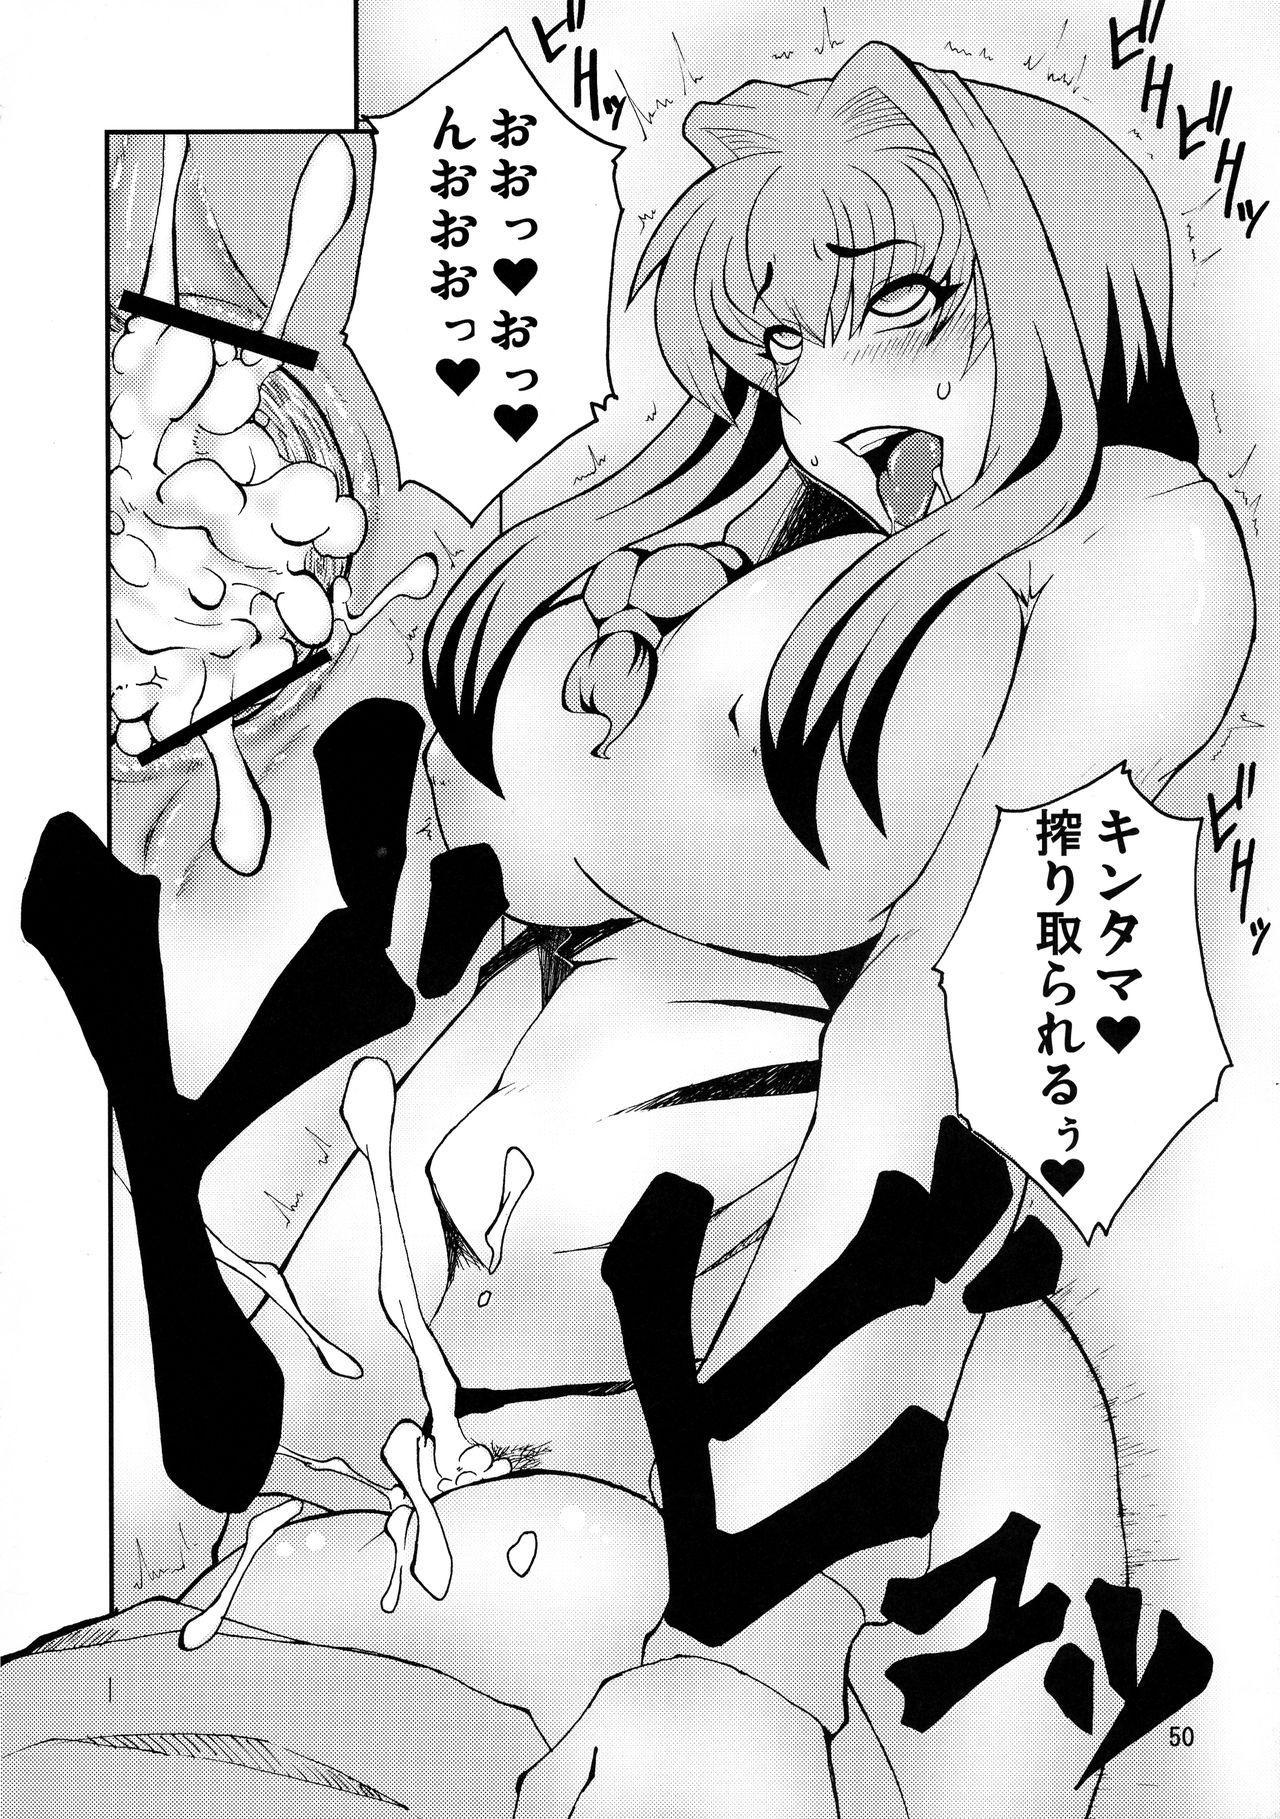 Kyouki Vol. 3~5 Remake Ver. 49